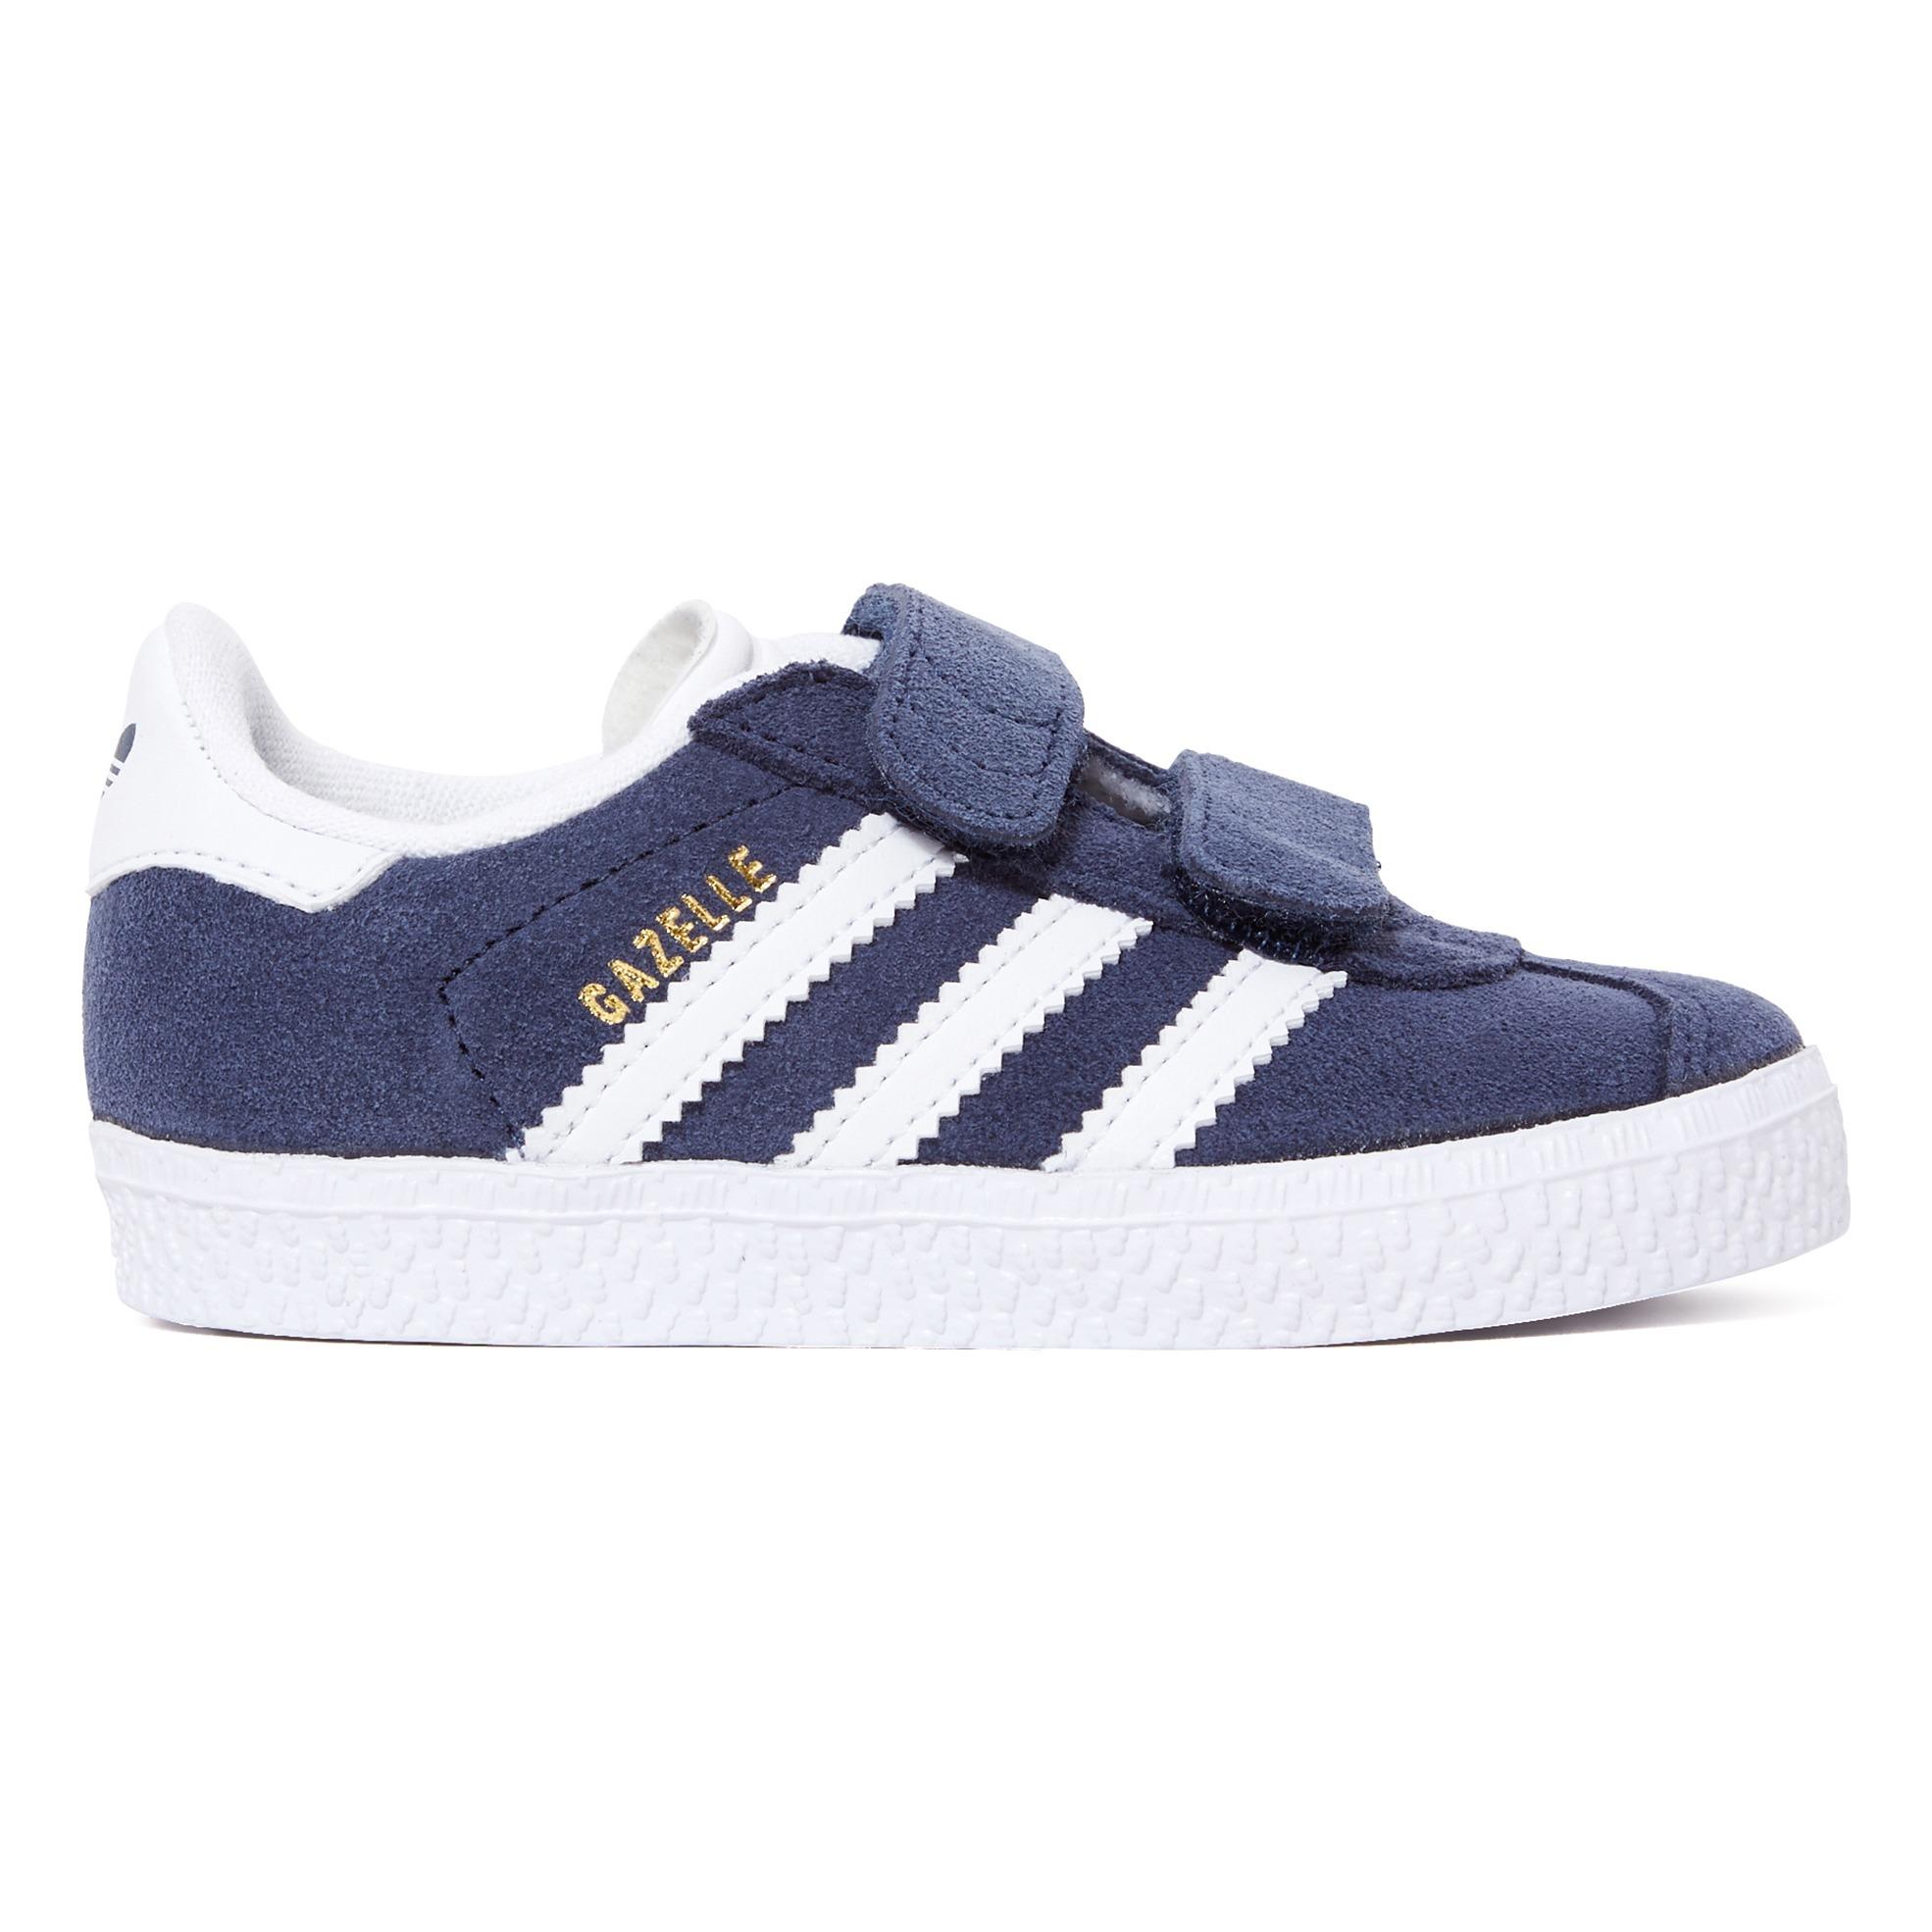 adidas Originals Gazelle Klettverschluss Schuhe 2016